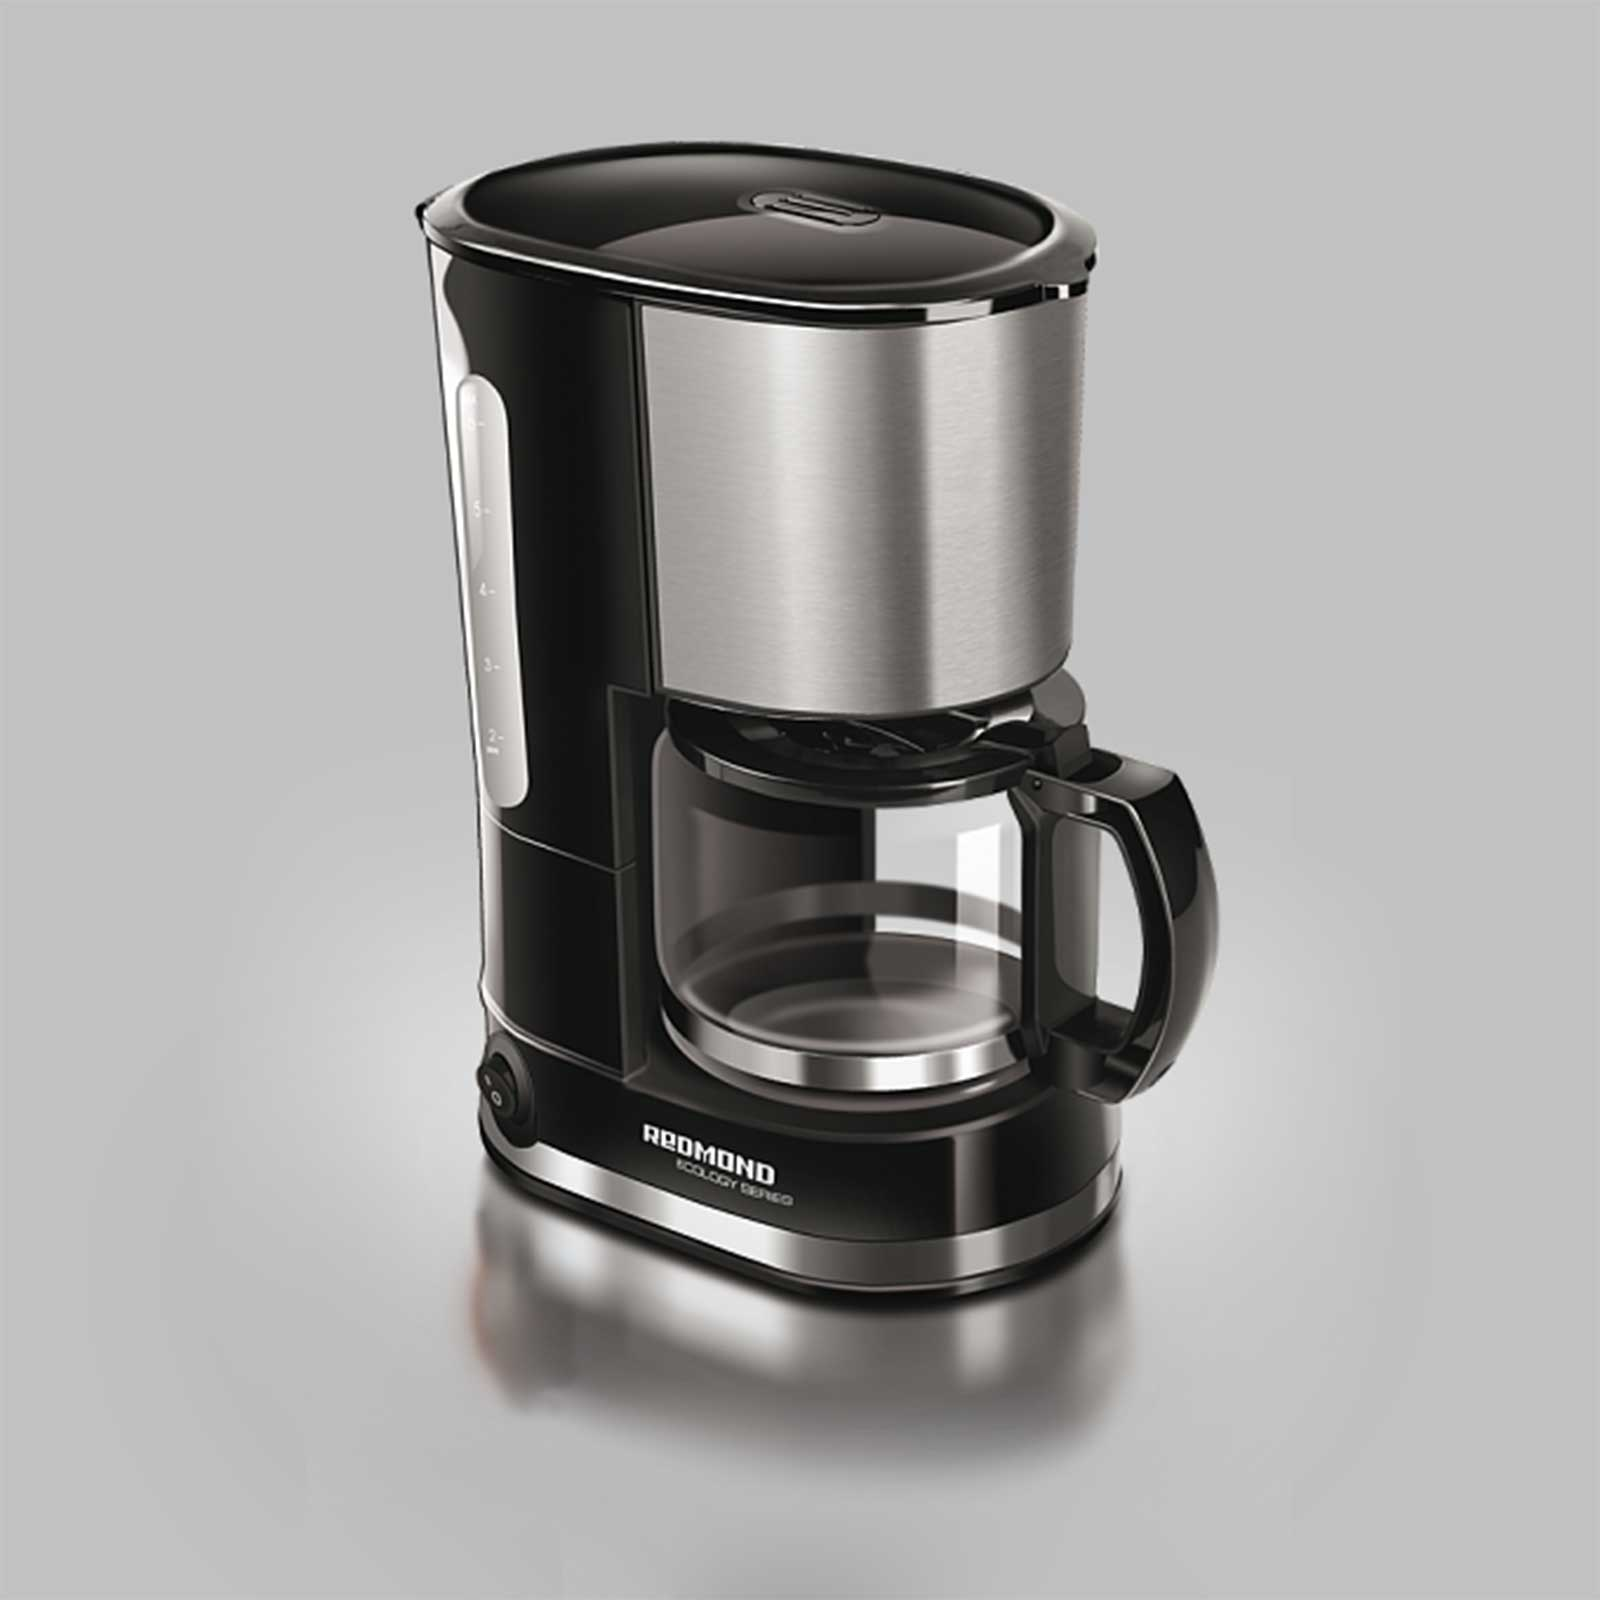 Кофеварка с функцией автоподогрева и «анти капля»